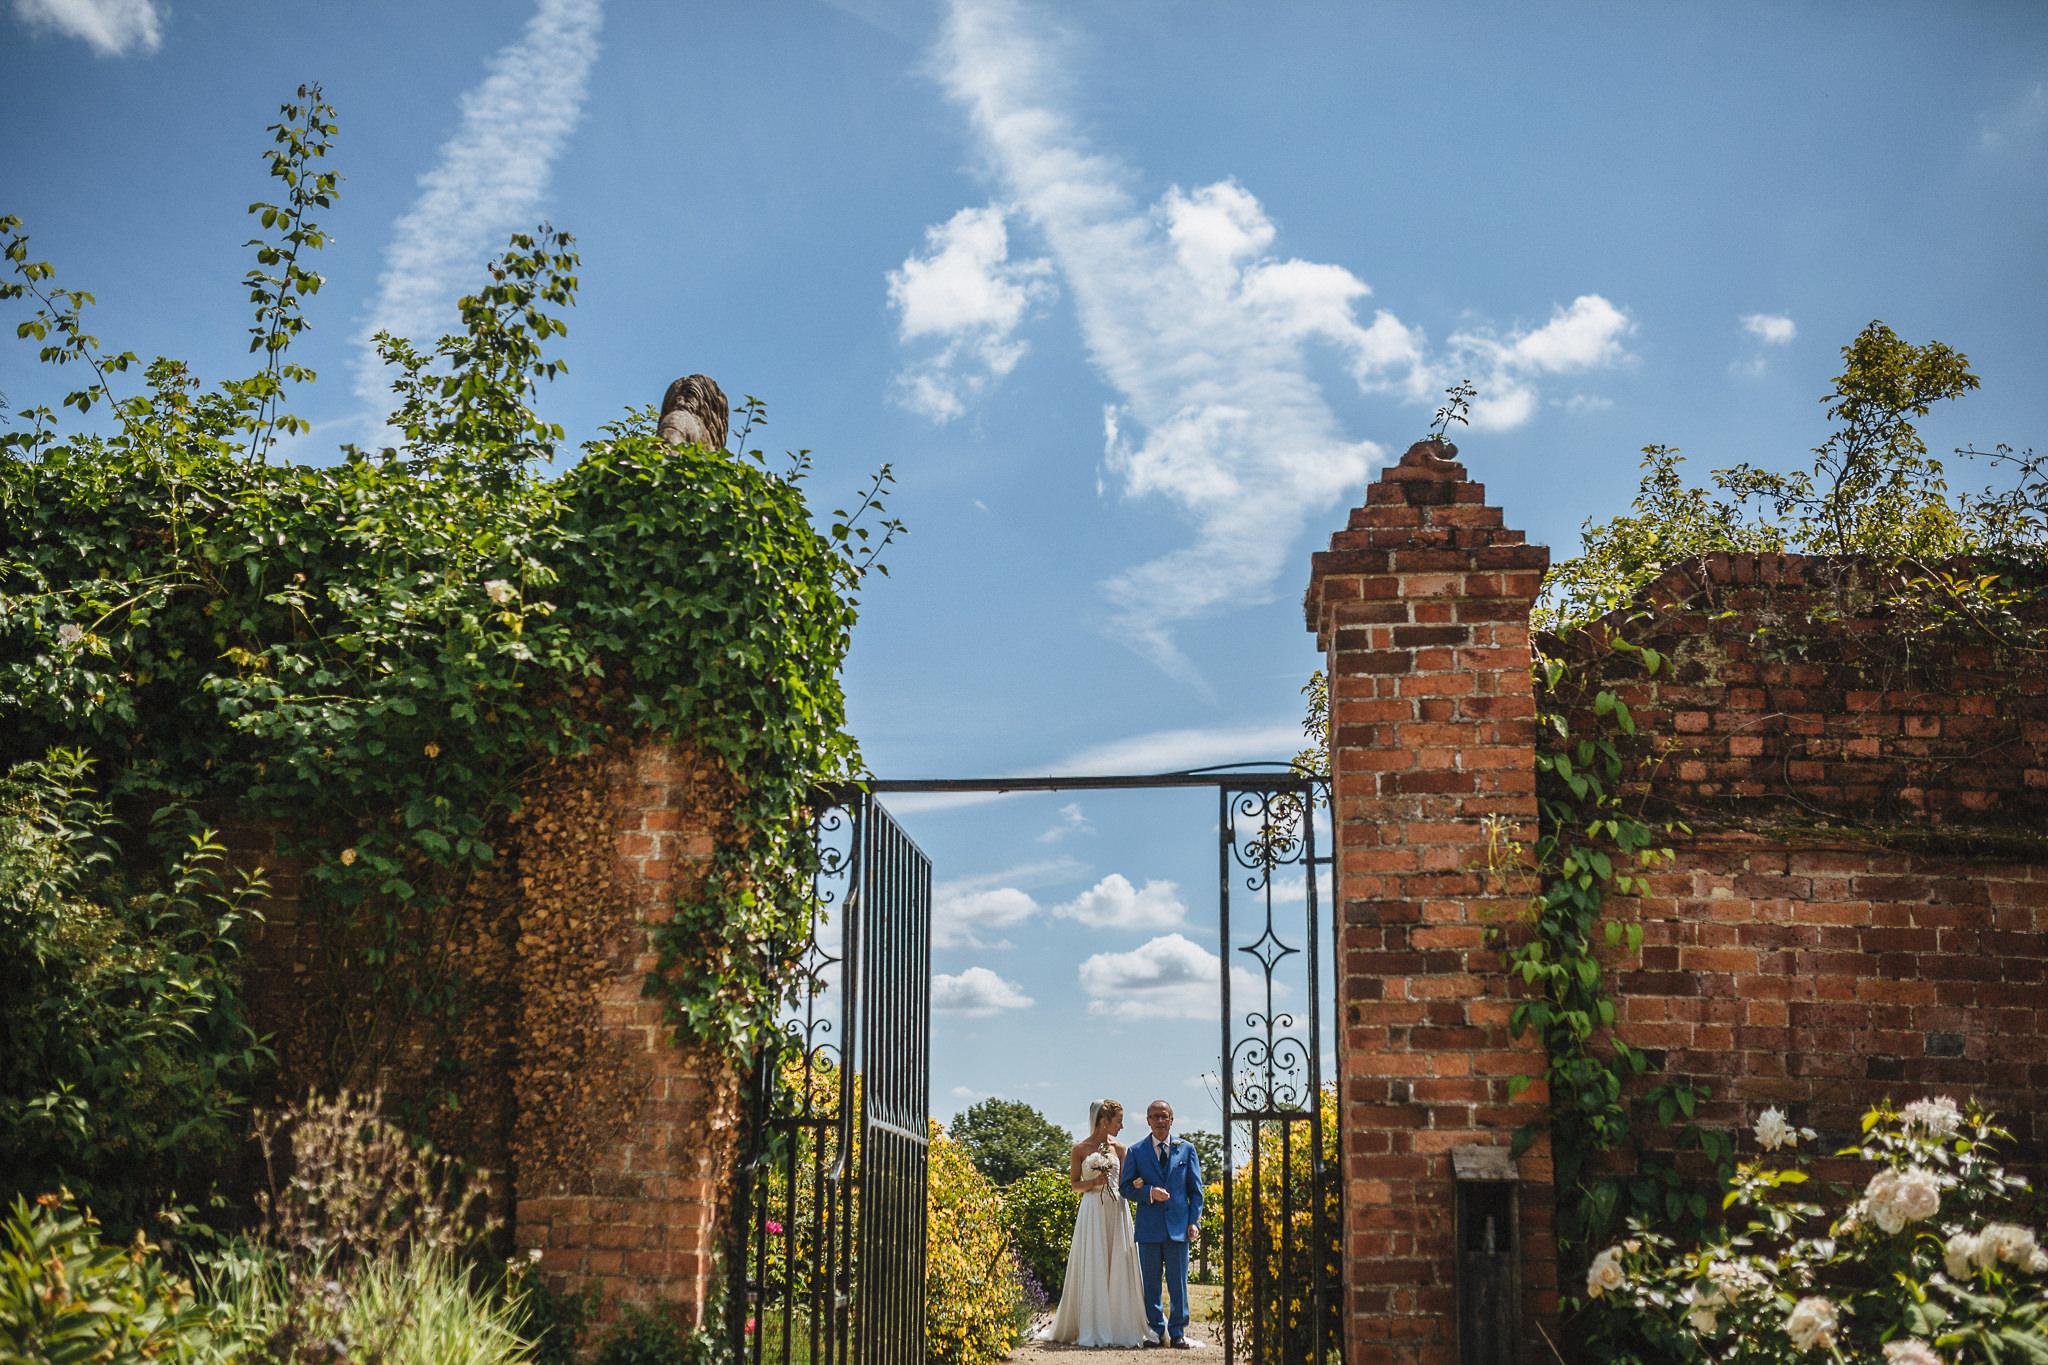 paul-marbrook-Gaynes-Park Wedding-Photographer-90041